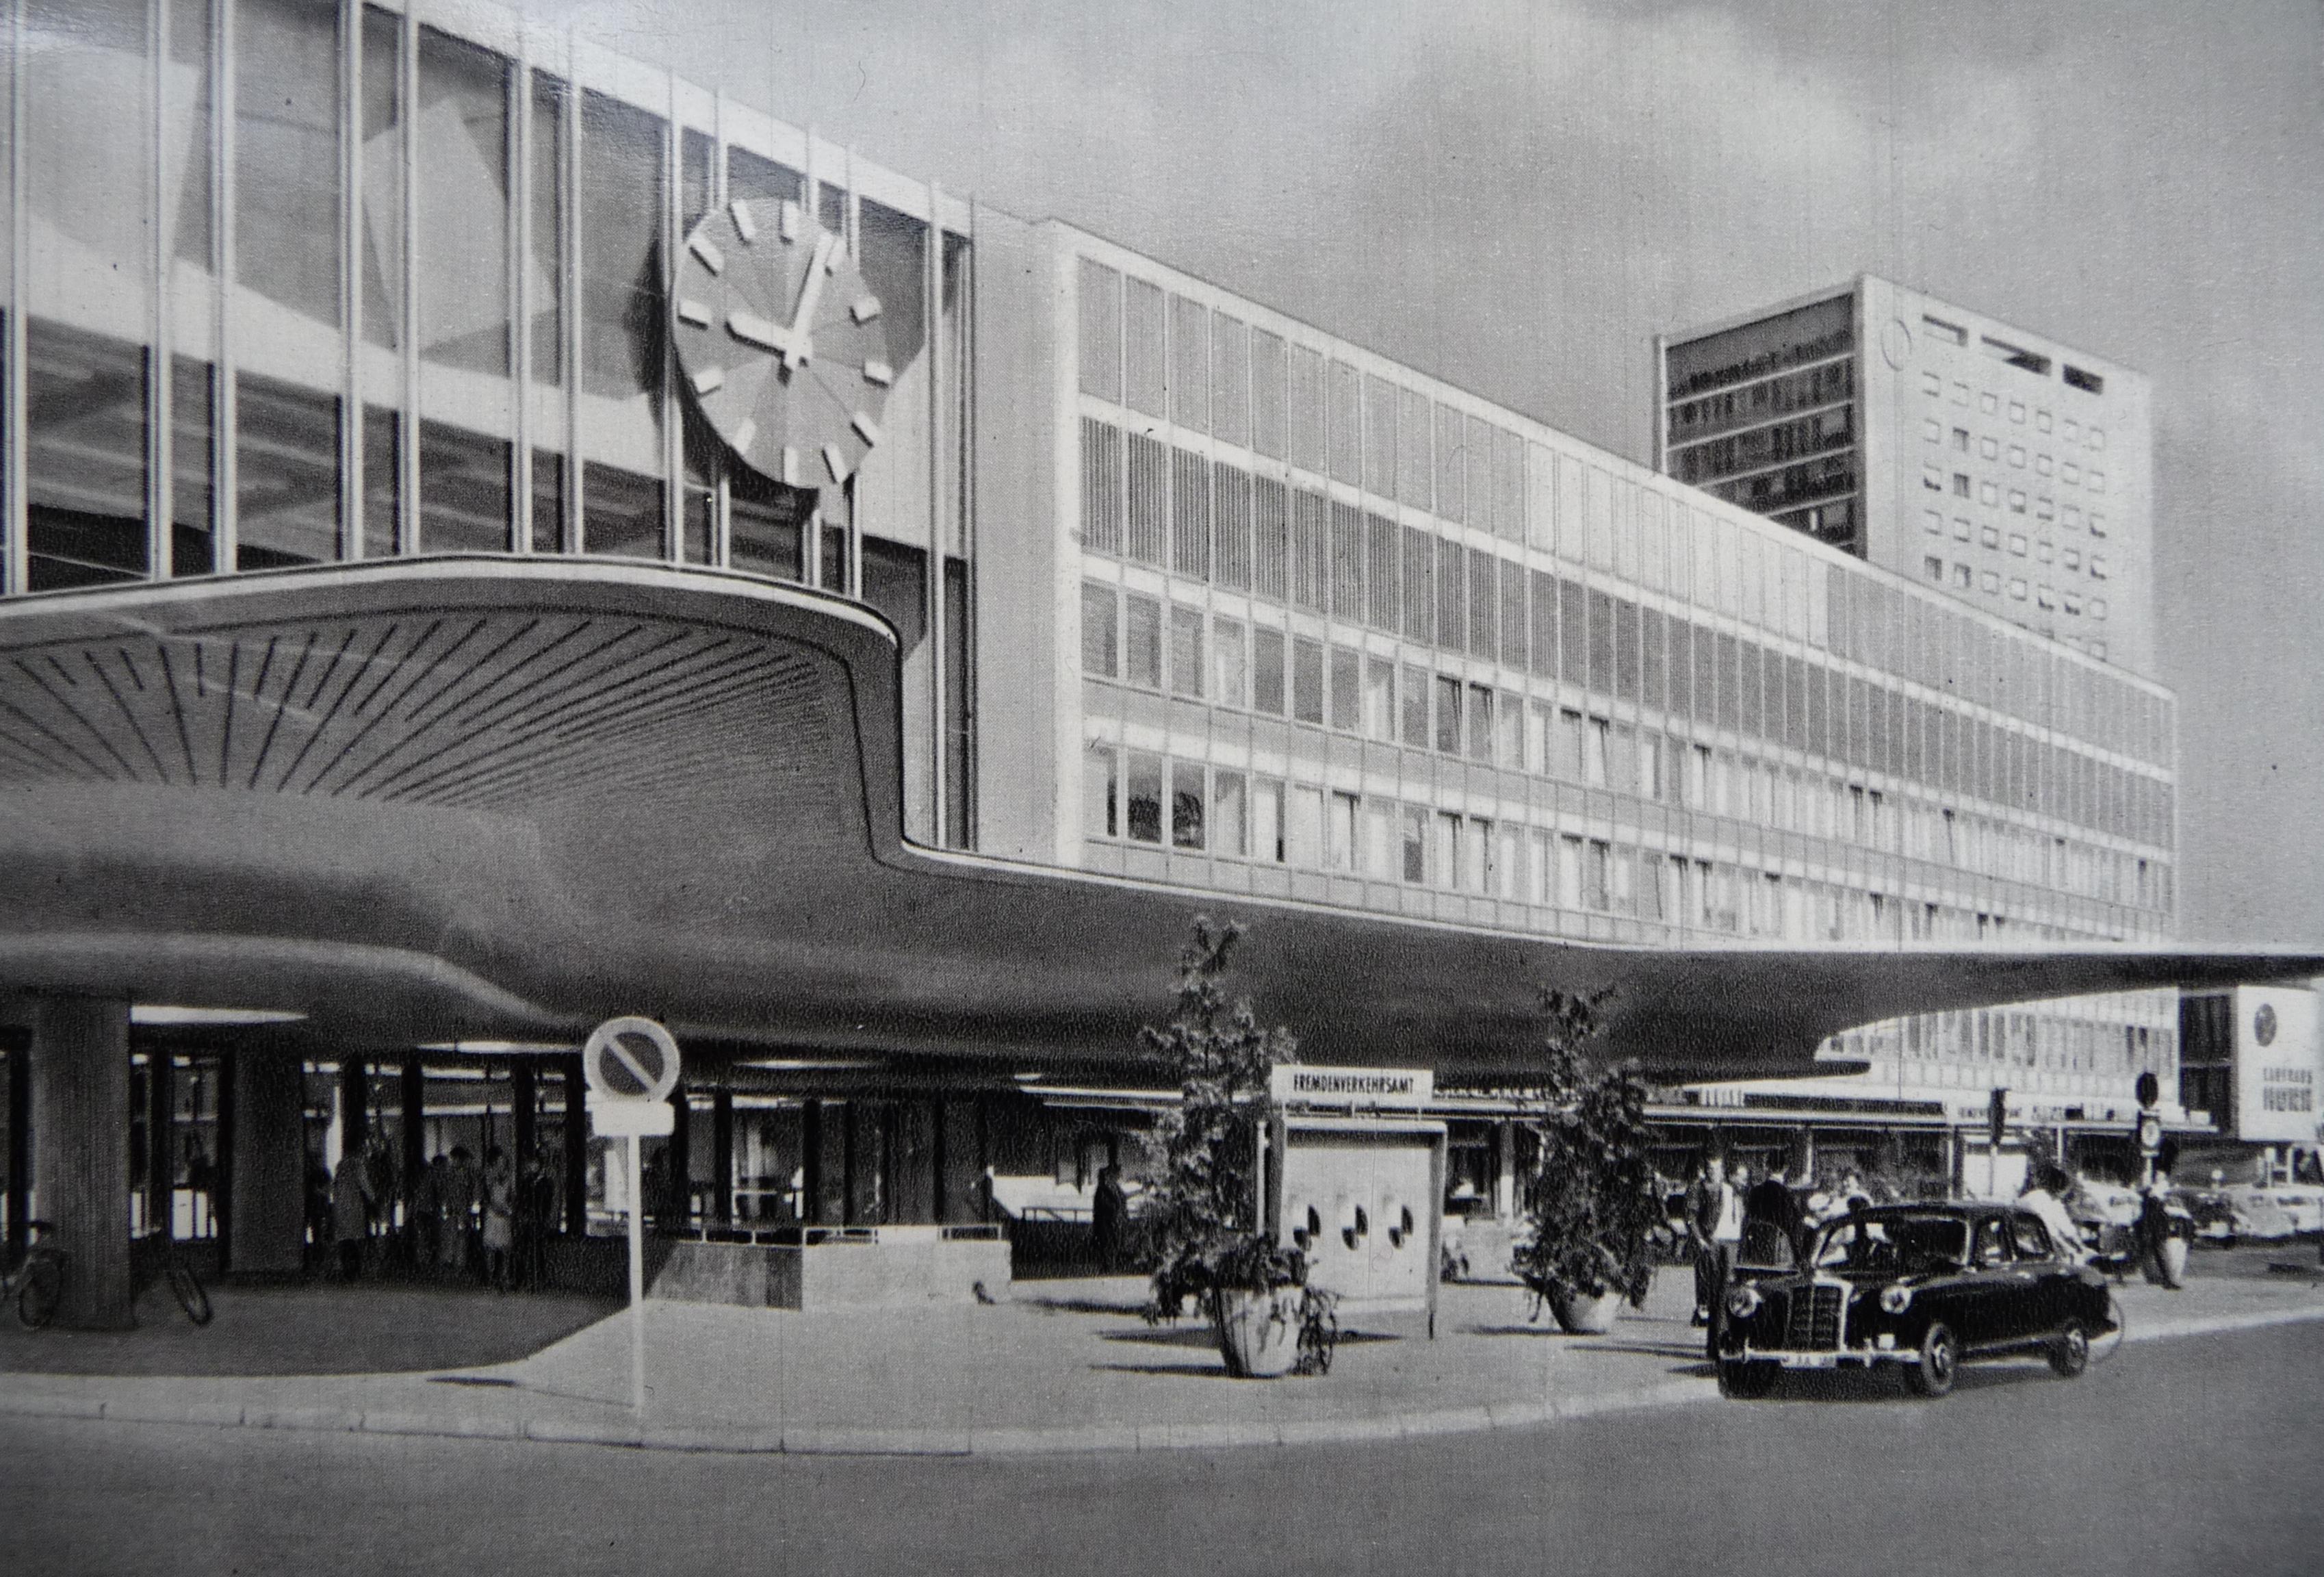 Karstadt M Ef Bf Bdnchen Hauptbahnhof Cafe